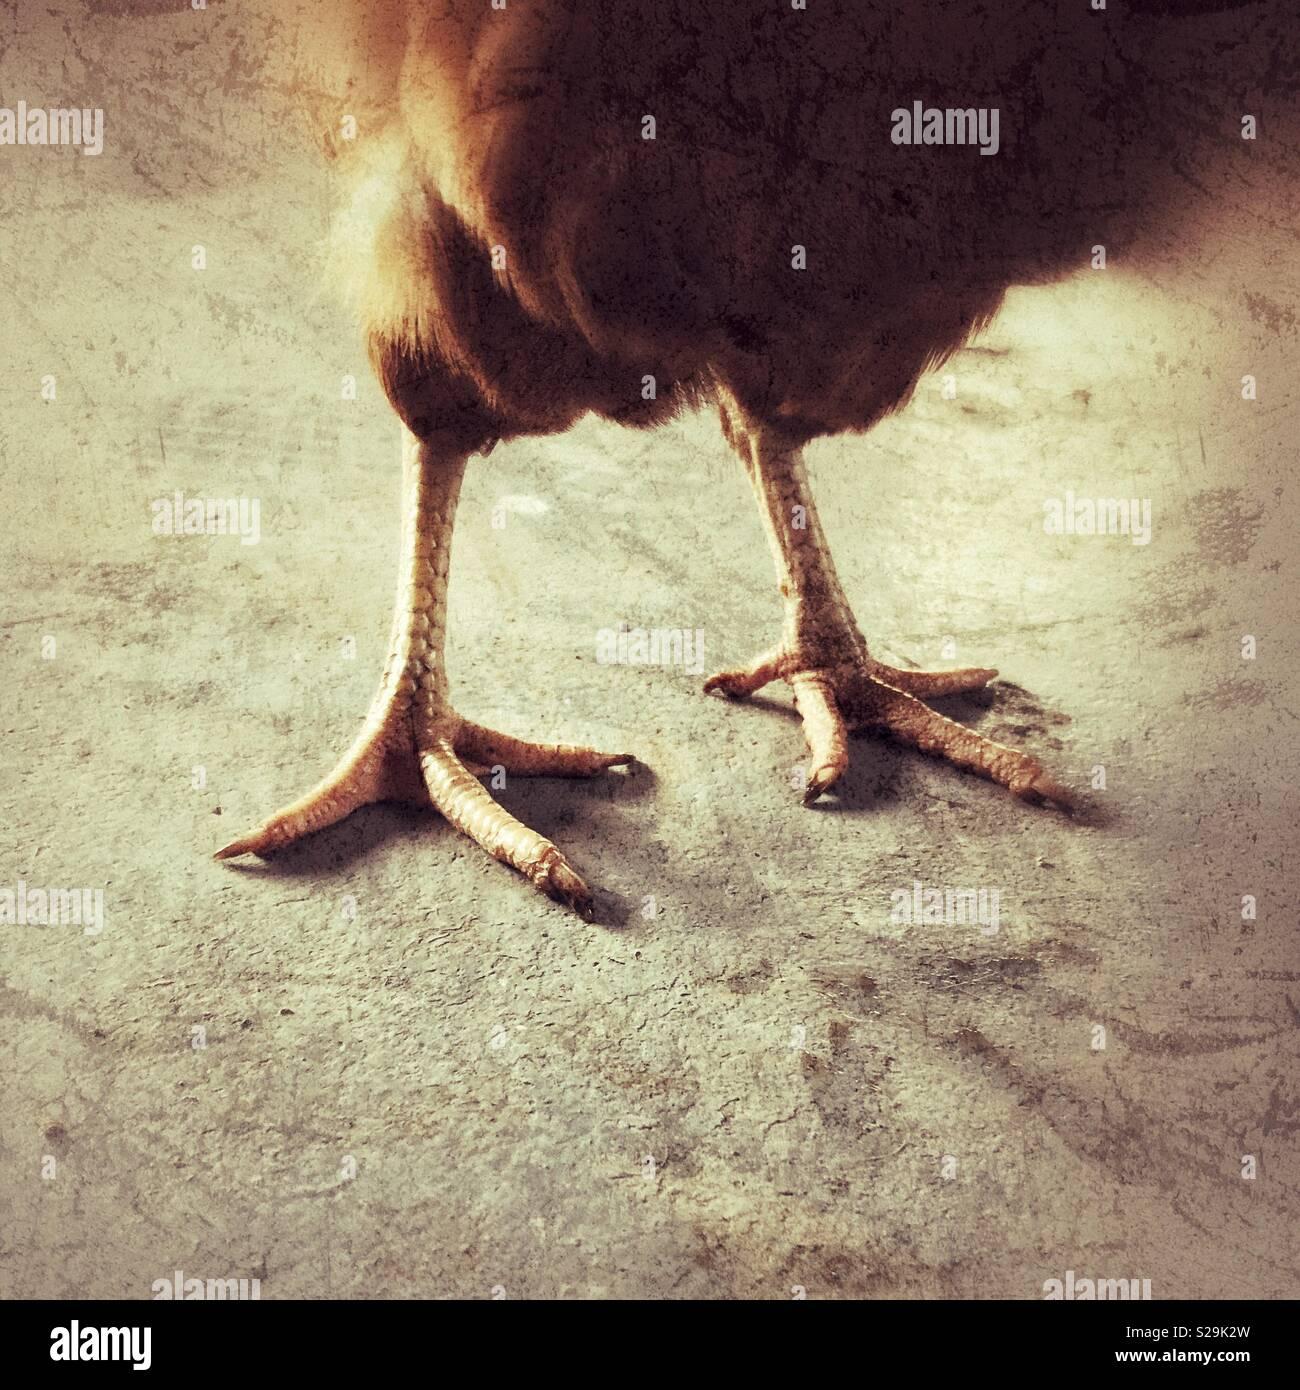 Creative closeup of chicken feet on standing live chicken - Stock Image